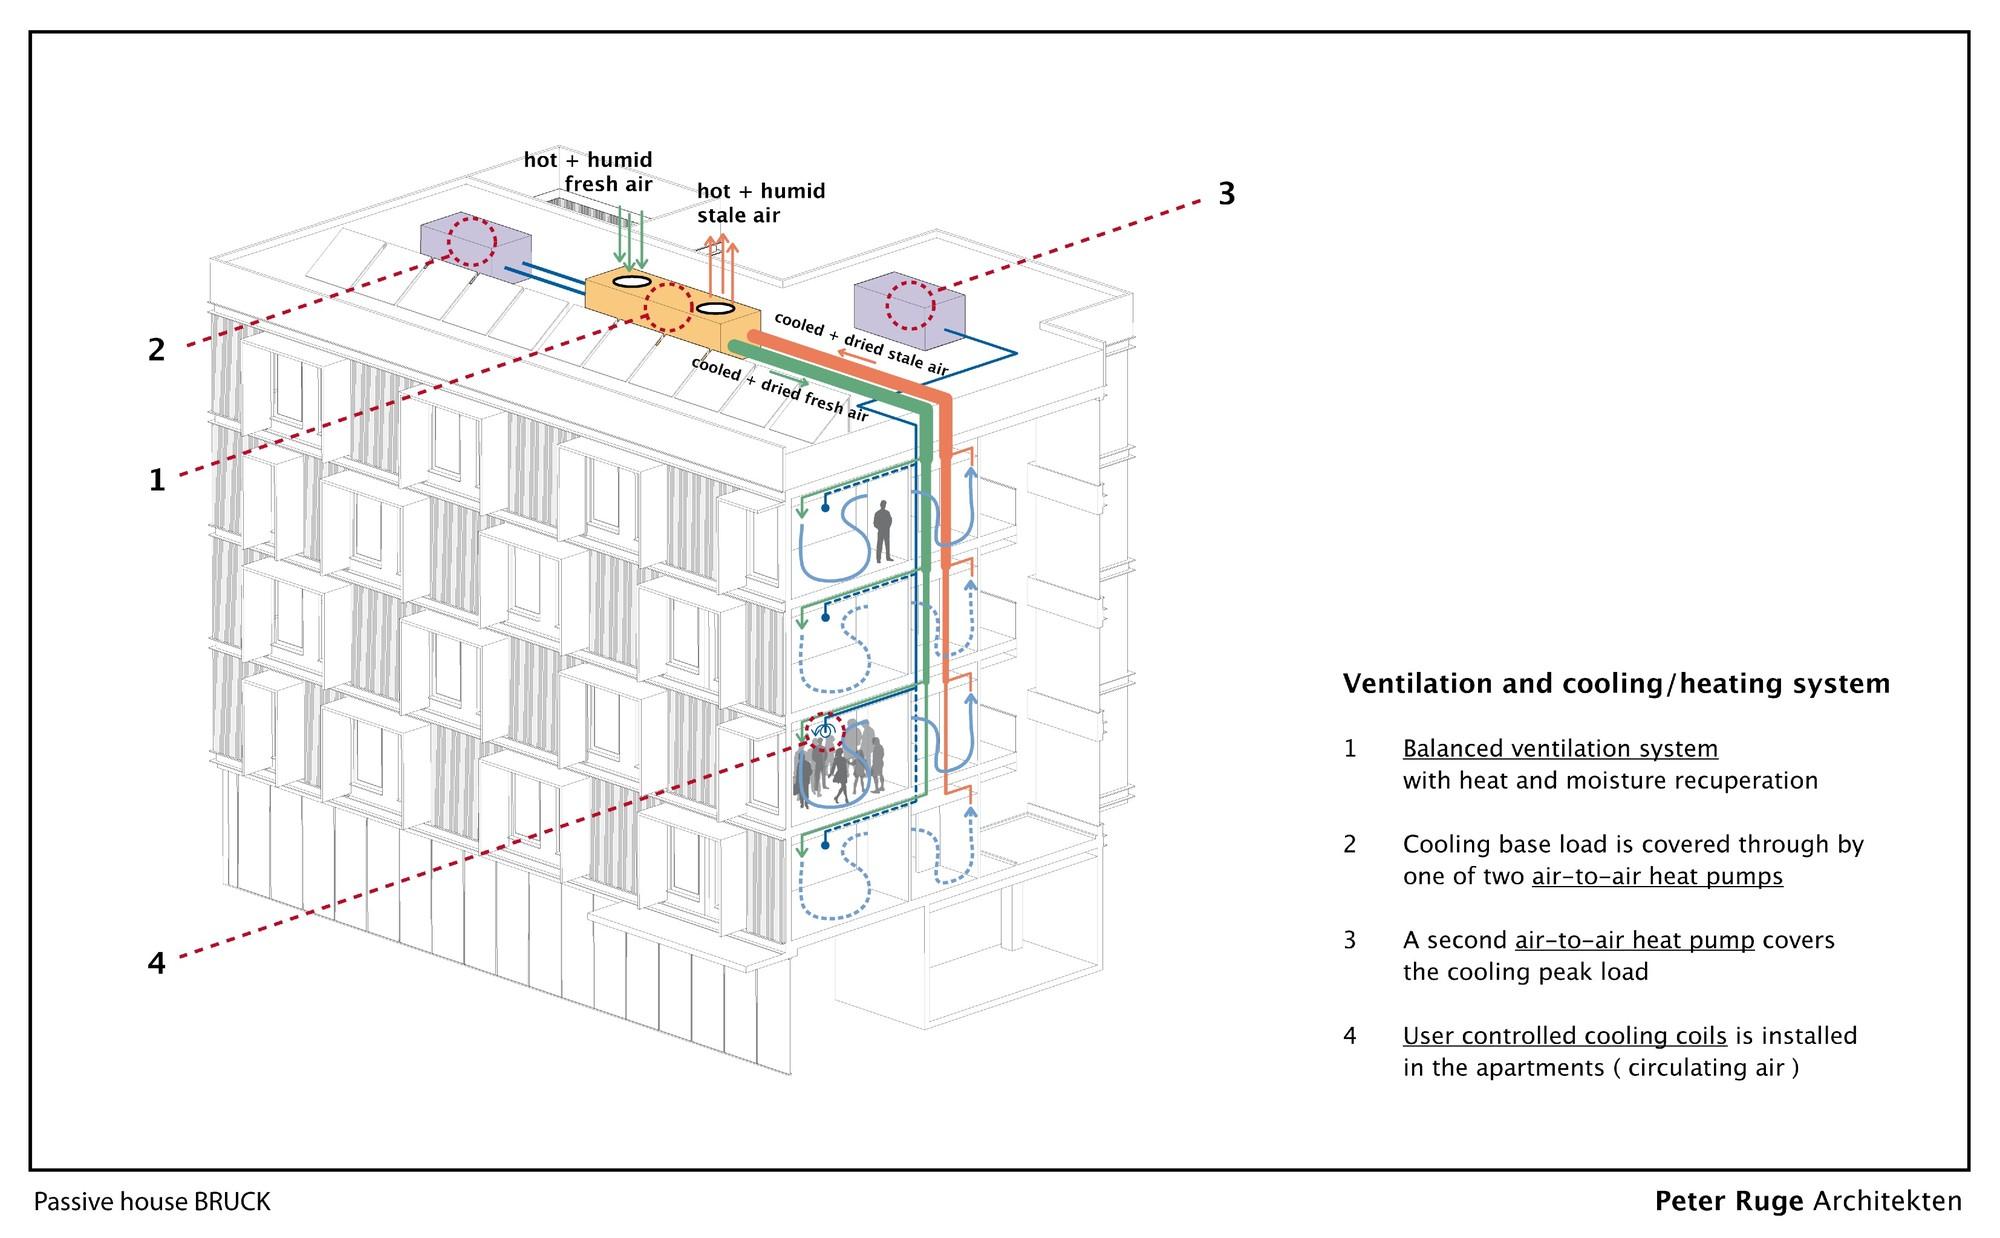 passive house bruck    peter ruge architekten